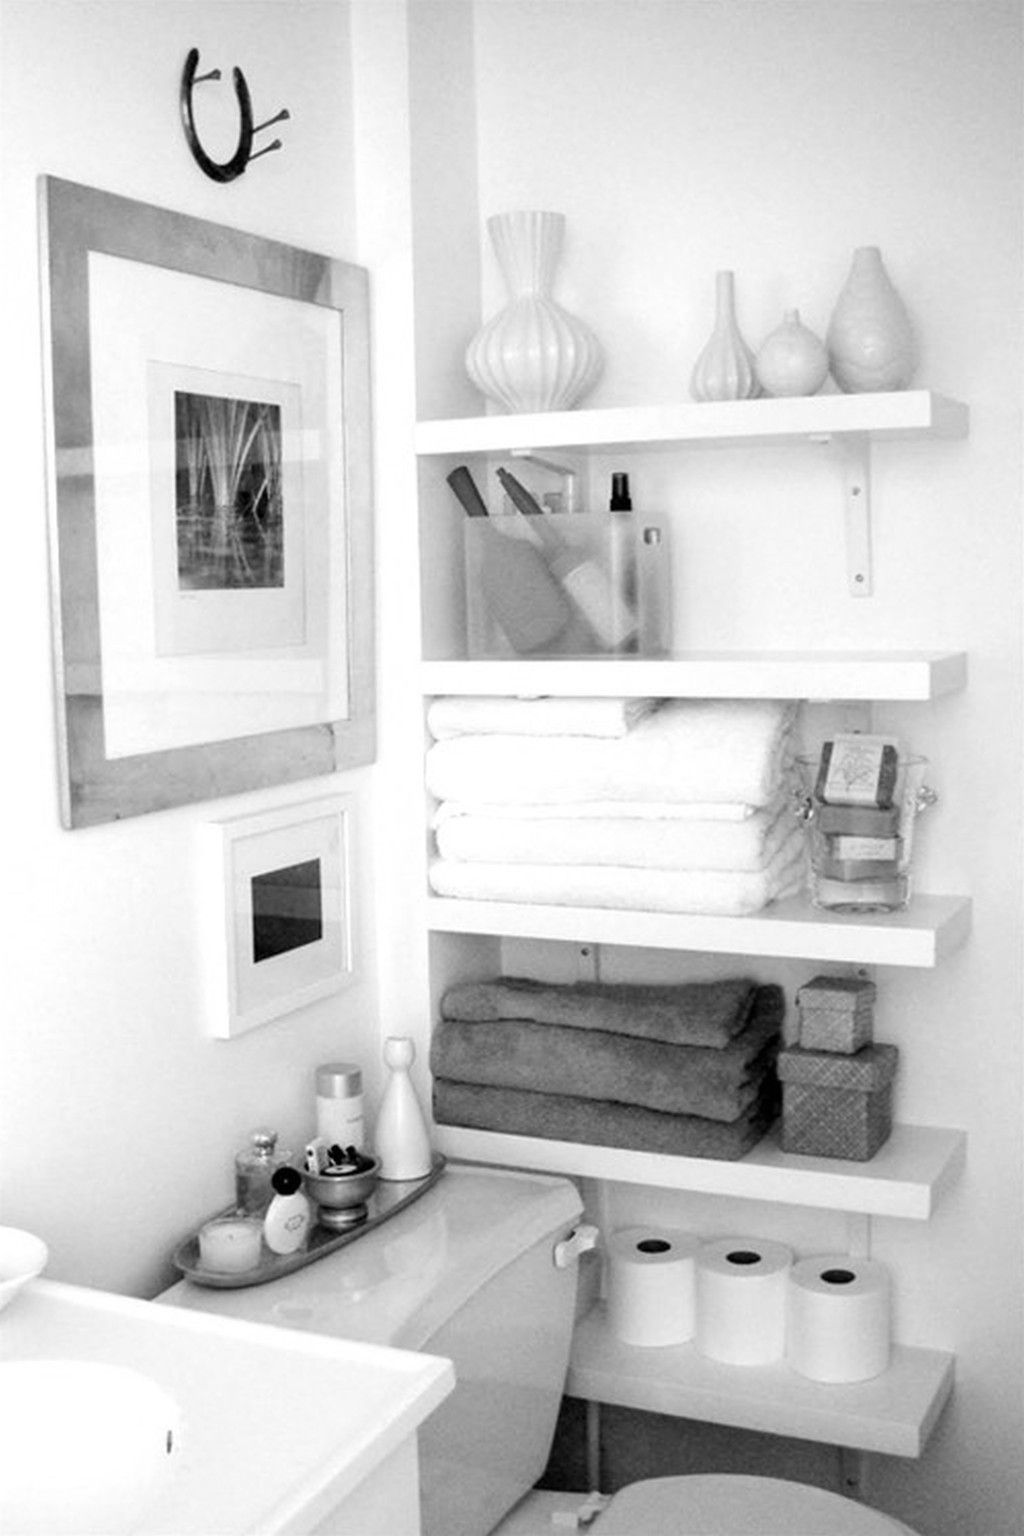 funky bathroom units - Google Search | Decor Inspo | Pinterest ...